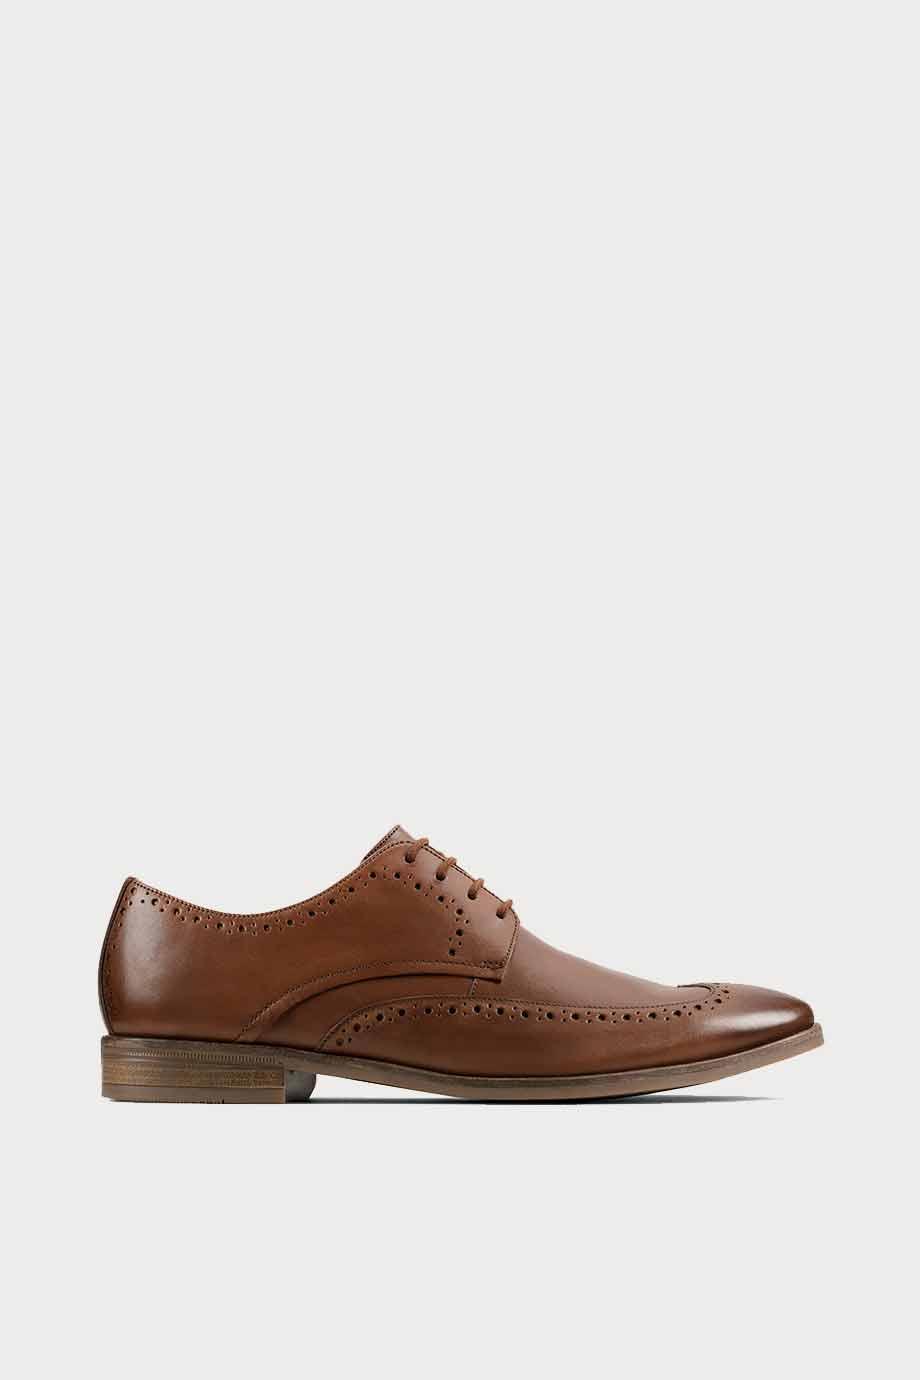 spiridoula metheniti shoes xalkida p Stanford Limit clarks tan leather 0